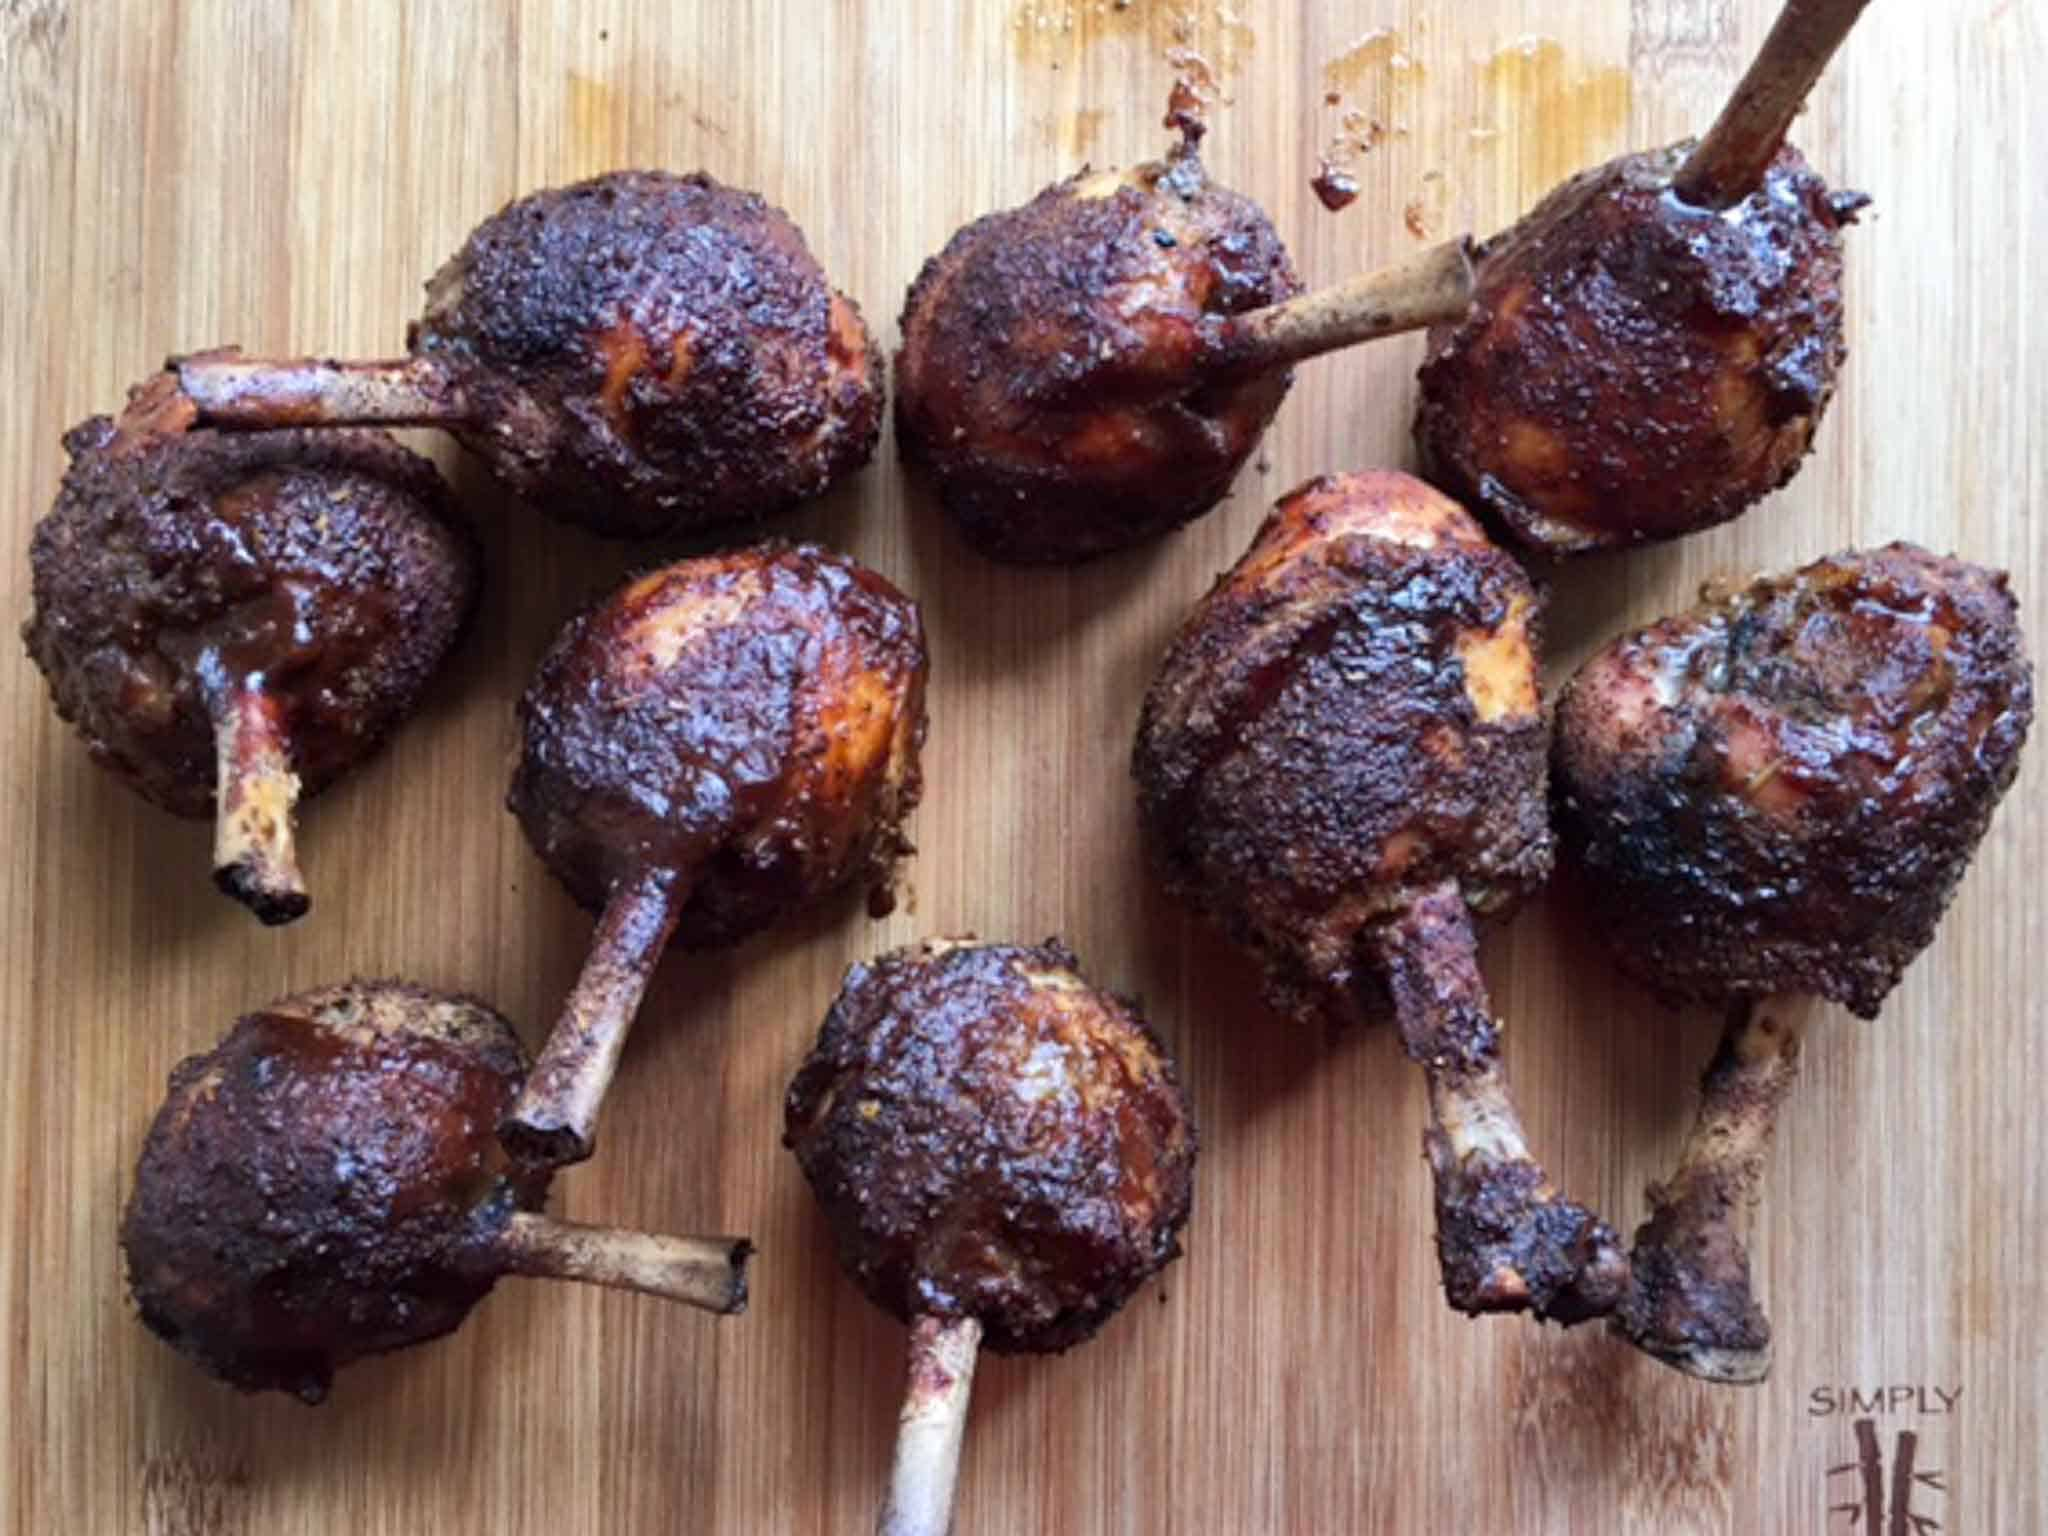 Chicken Lollipops smoked on wooden cutting board overhead shot